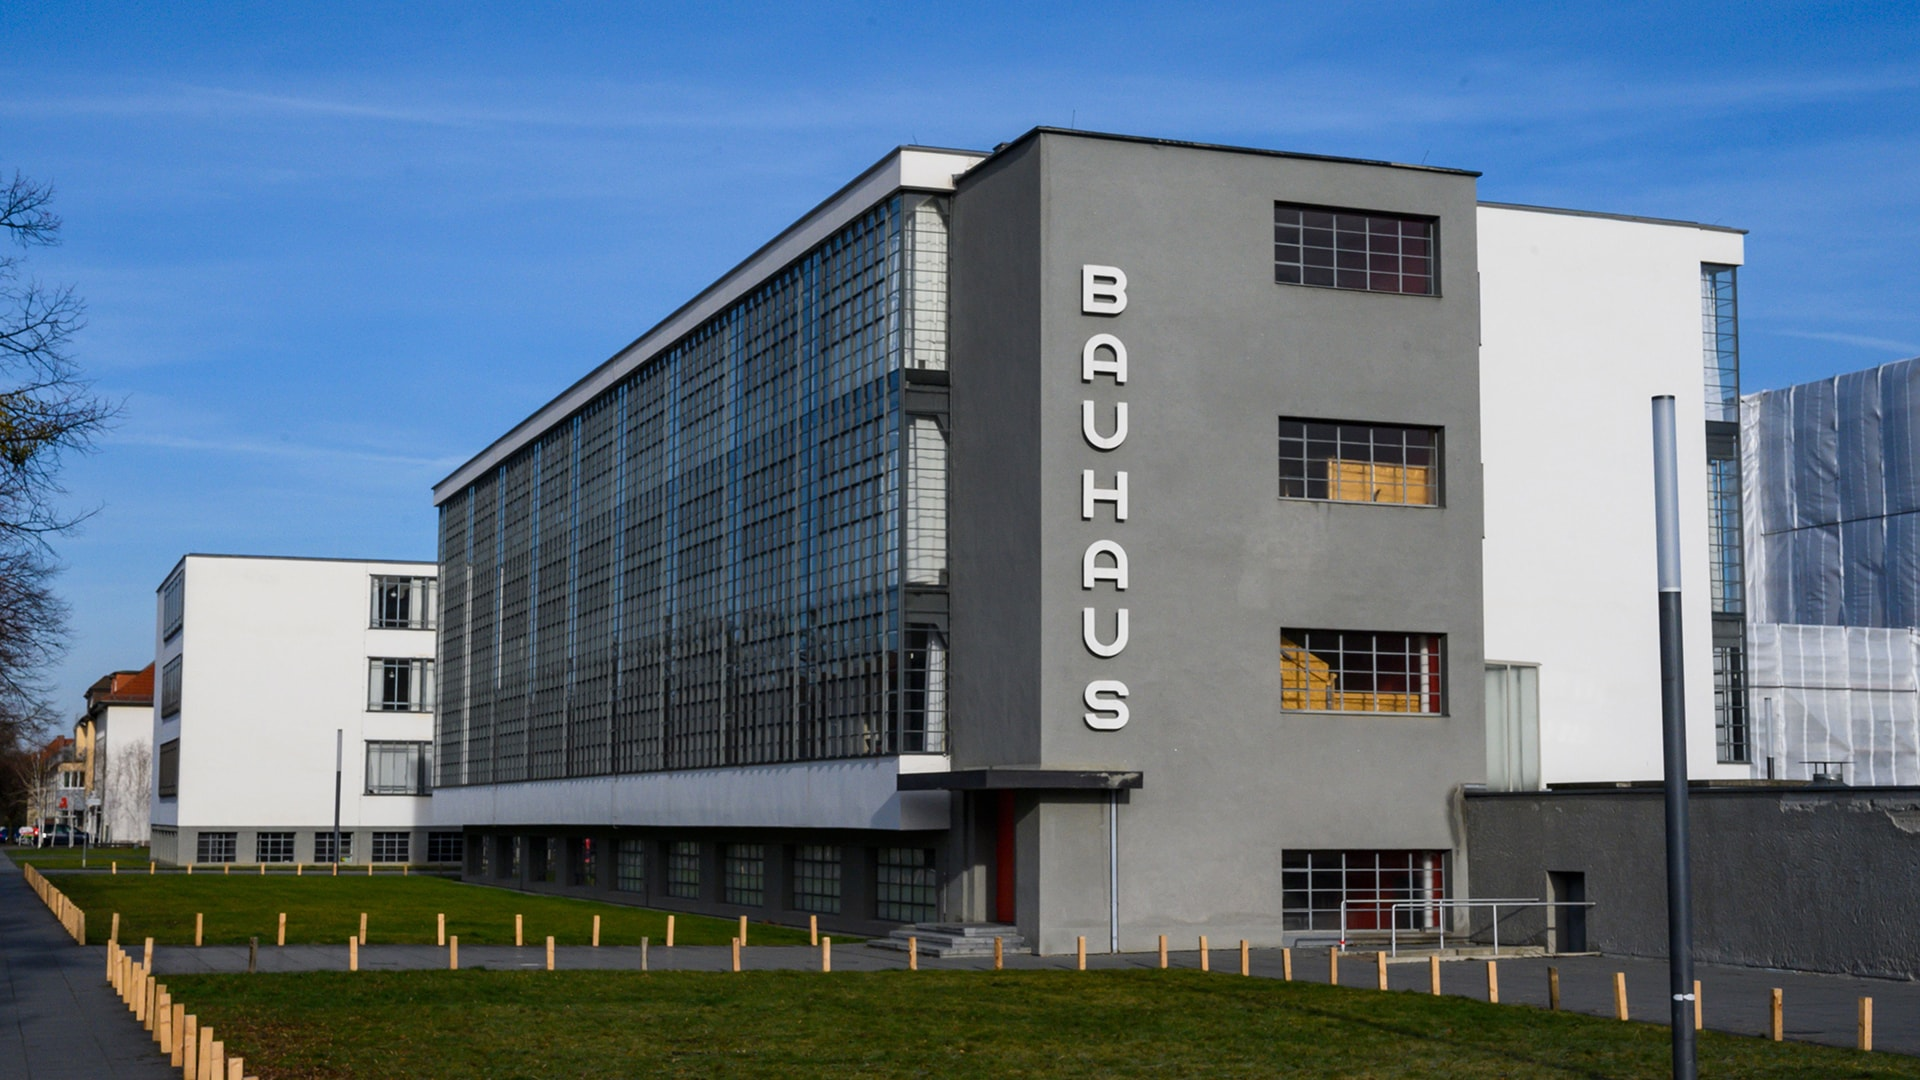 Rai5 dedica un'intera serata al Bauhaus con due documentari